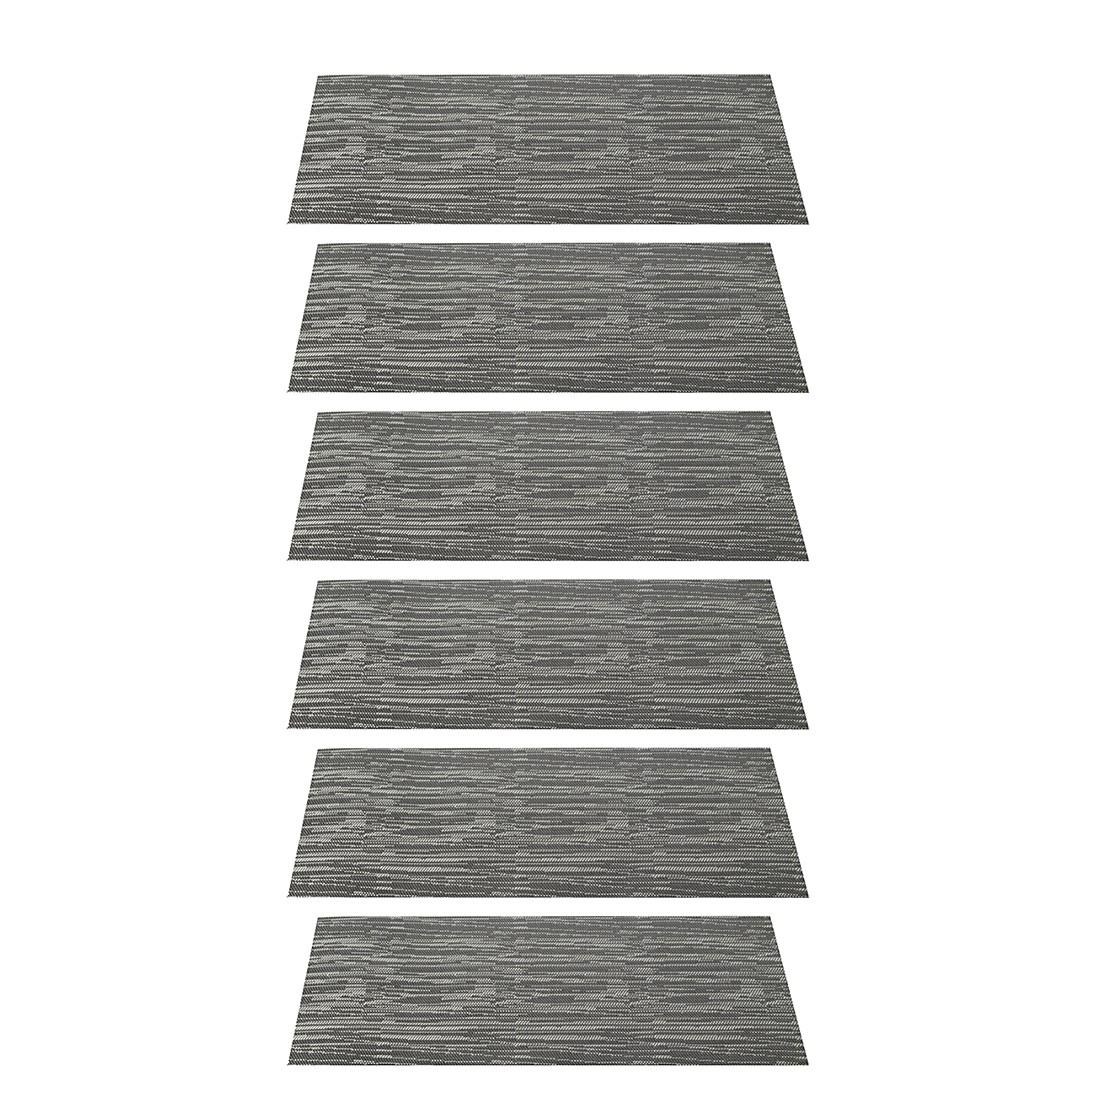 Platzset (6er-Set) – Grau meliert, Leonardo kaufen